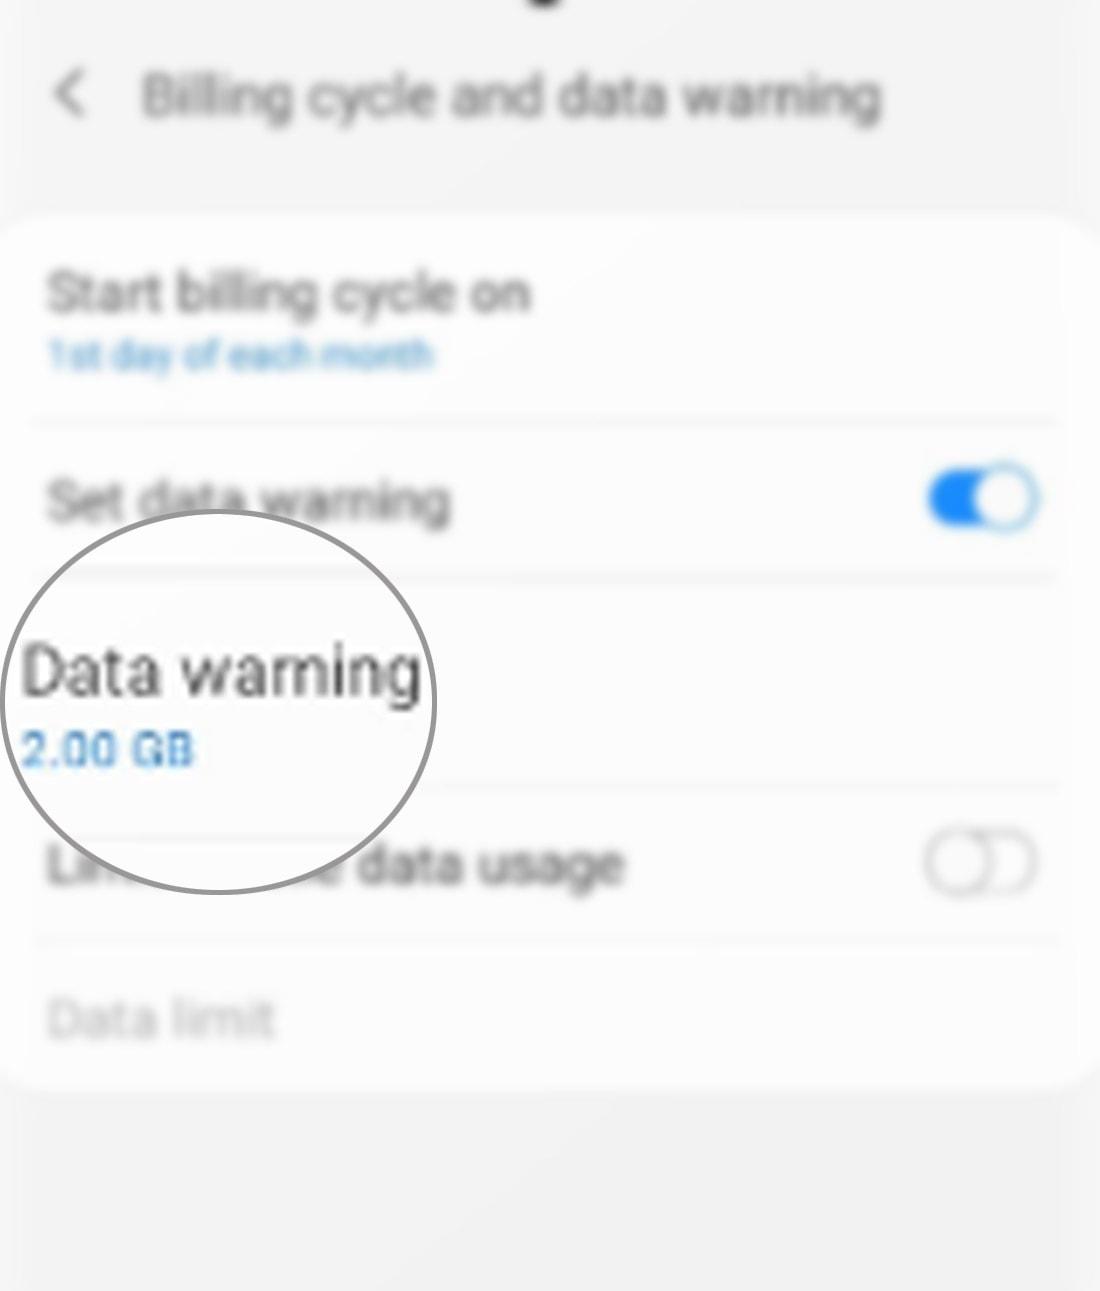 manage data usage galaxy s20 - data warning